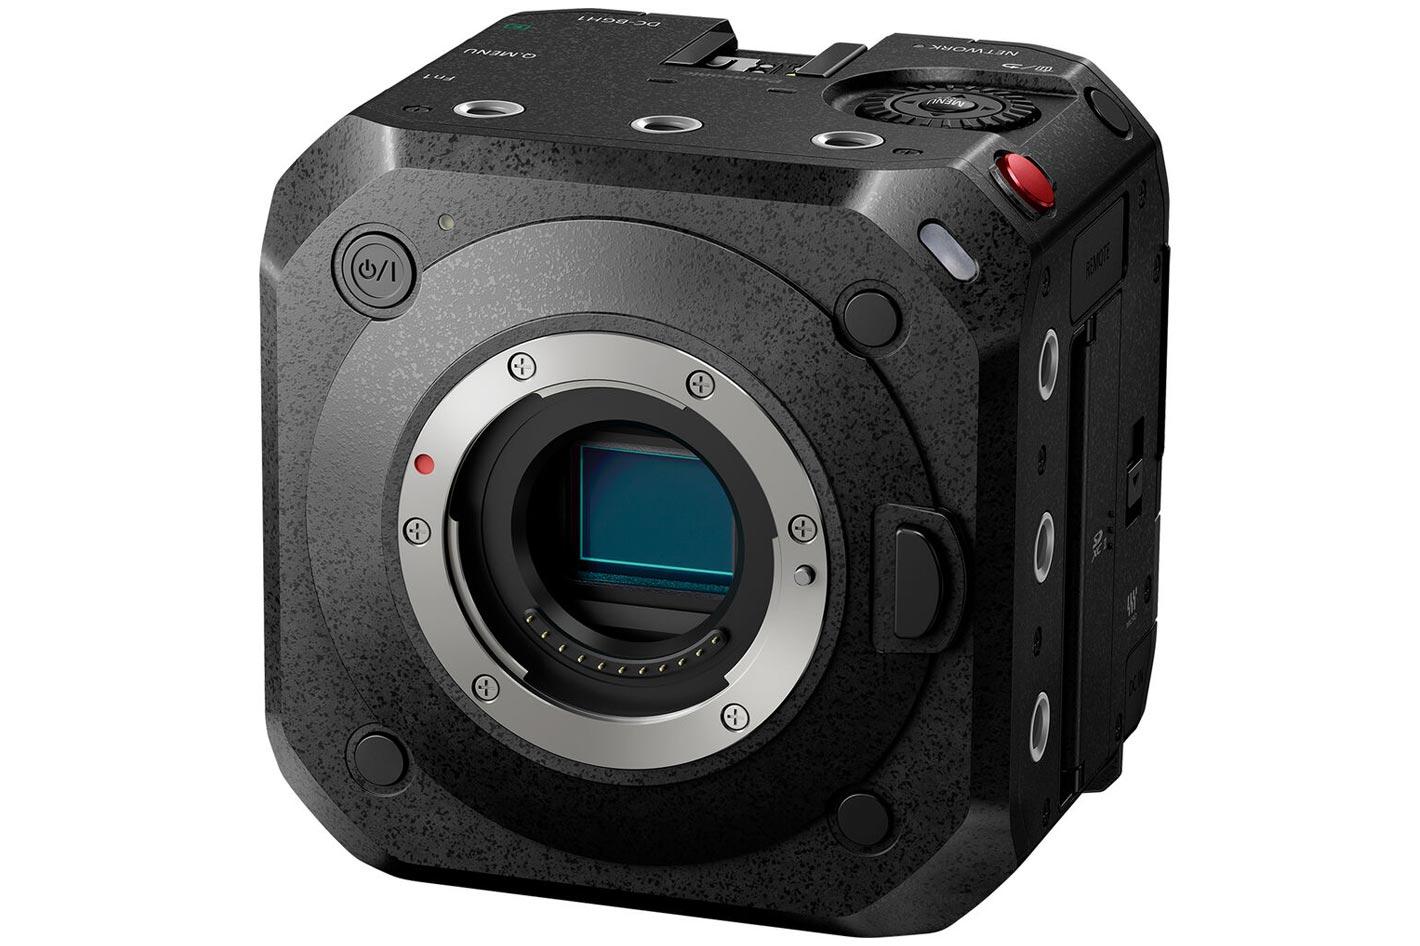 Lumix BGH1: a new MFT camera for cinema and live events